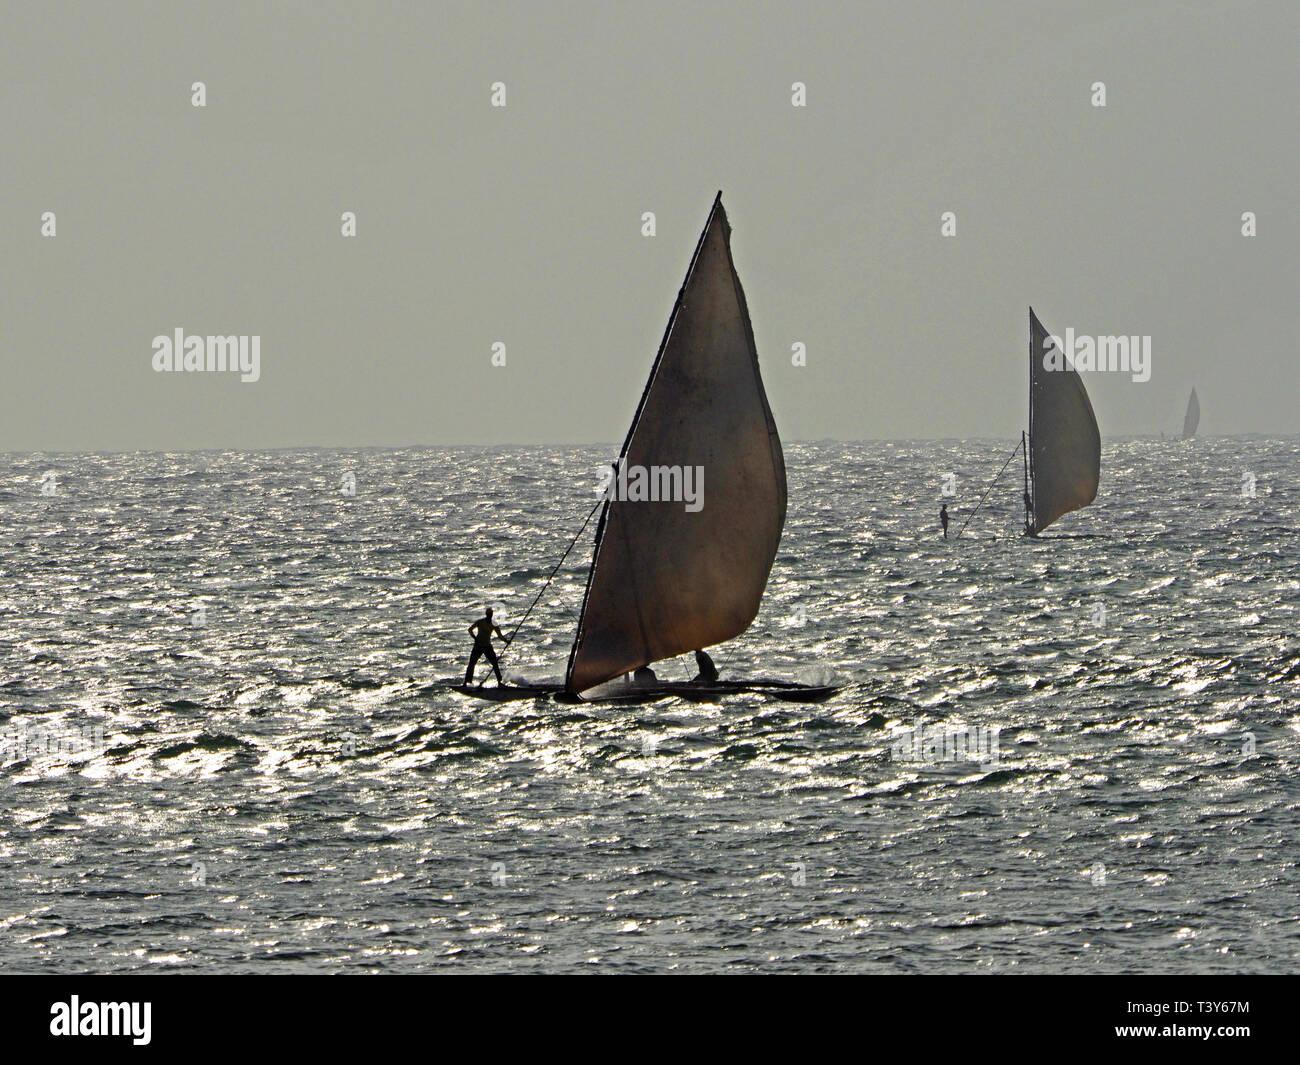 Lateen Sail Stock Photos & Lateen Sail Stock Images - Page 3